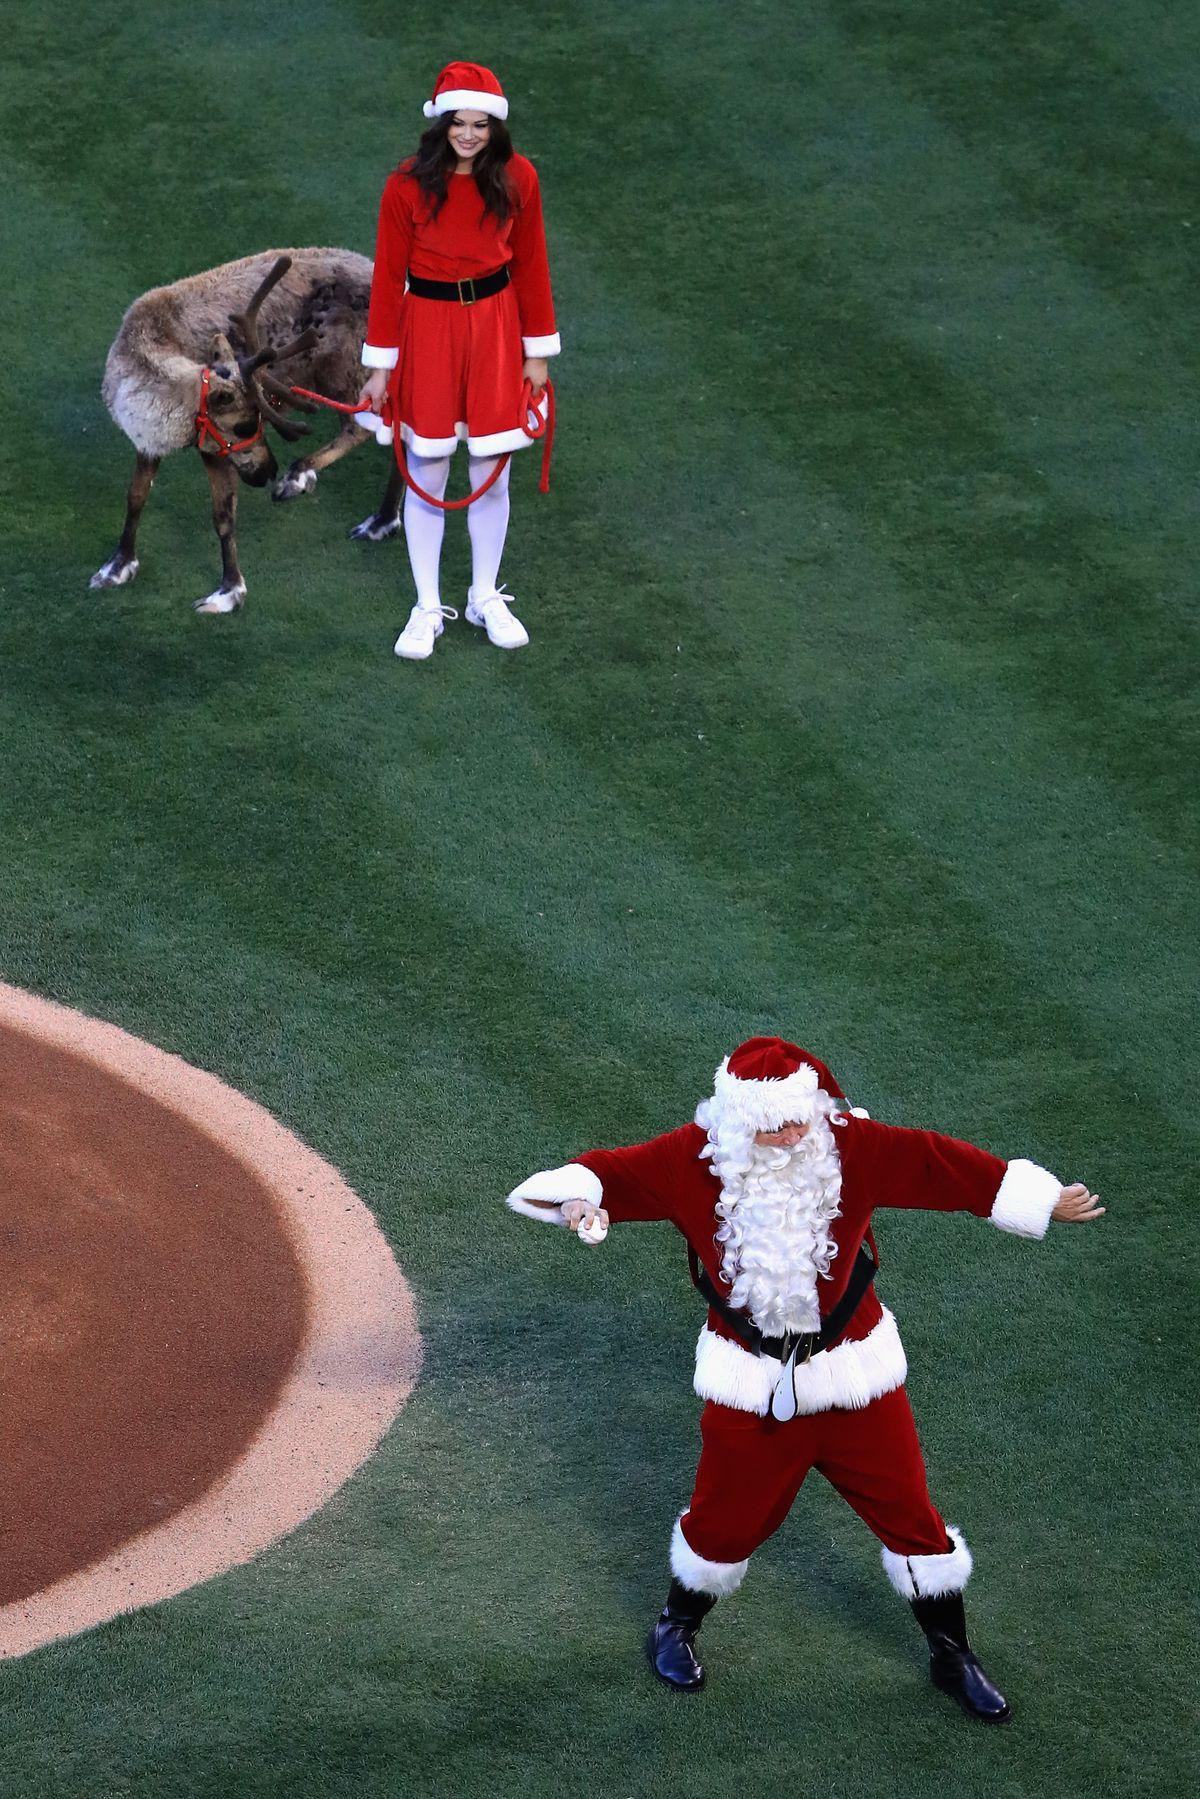 Kansas City Royals v Los Angeles Angels of Anaheim